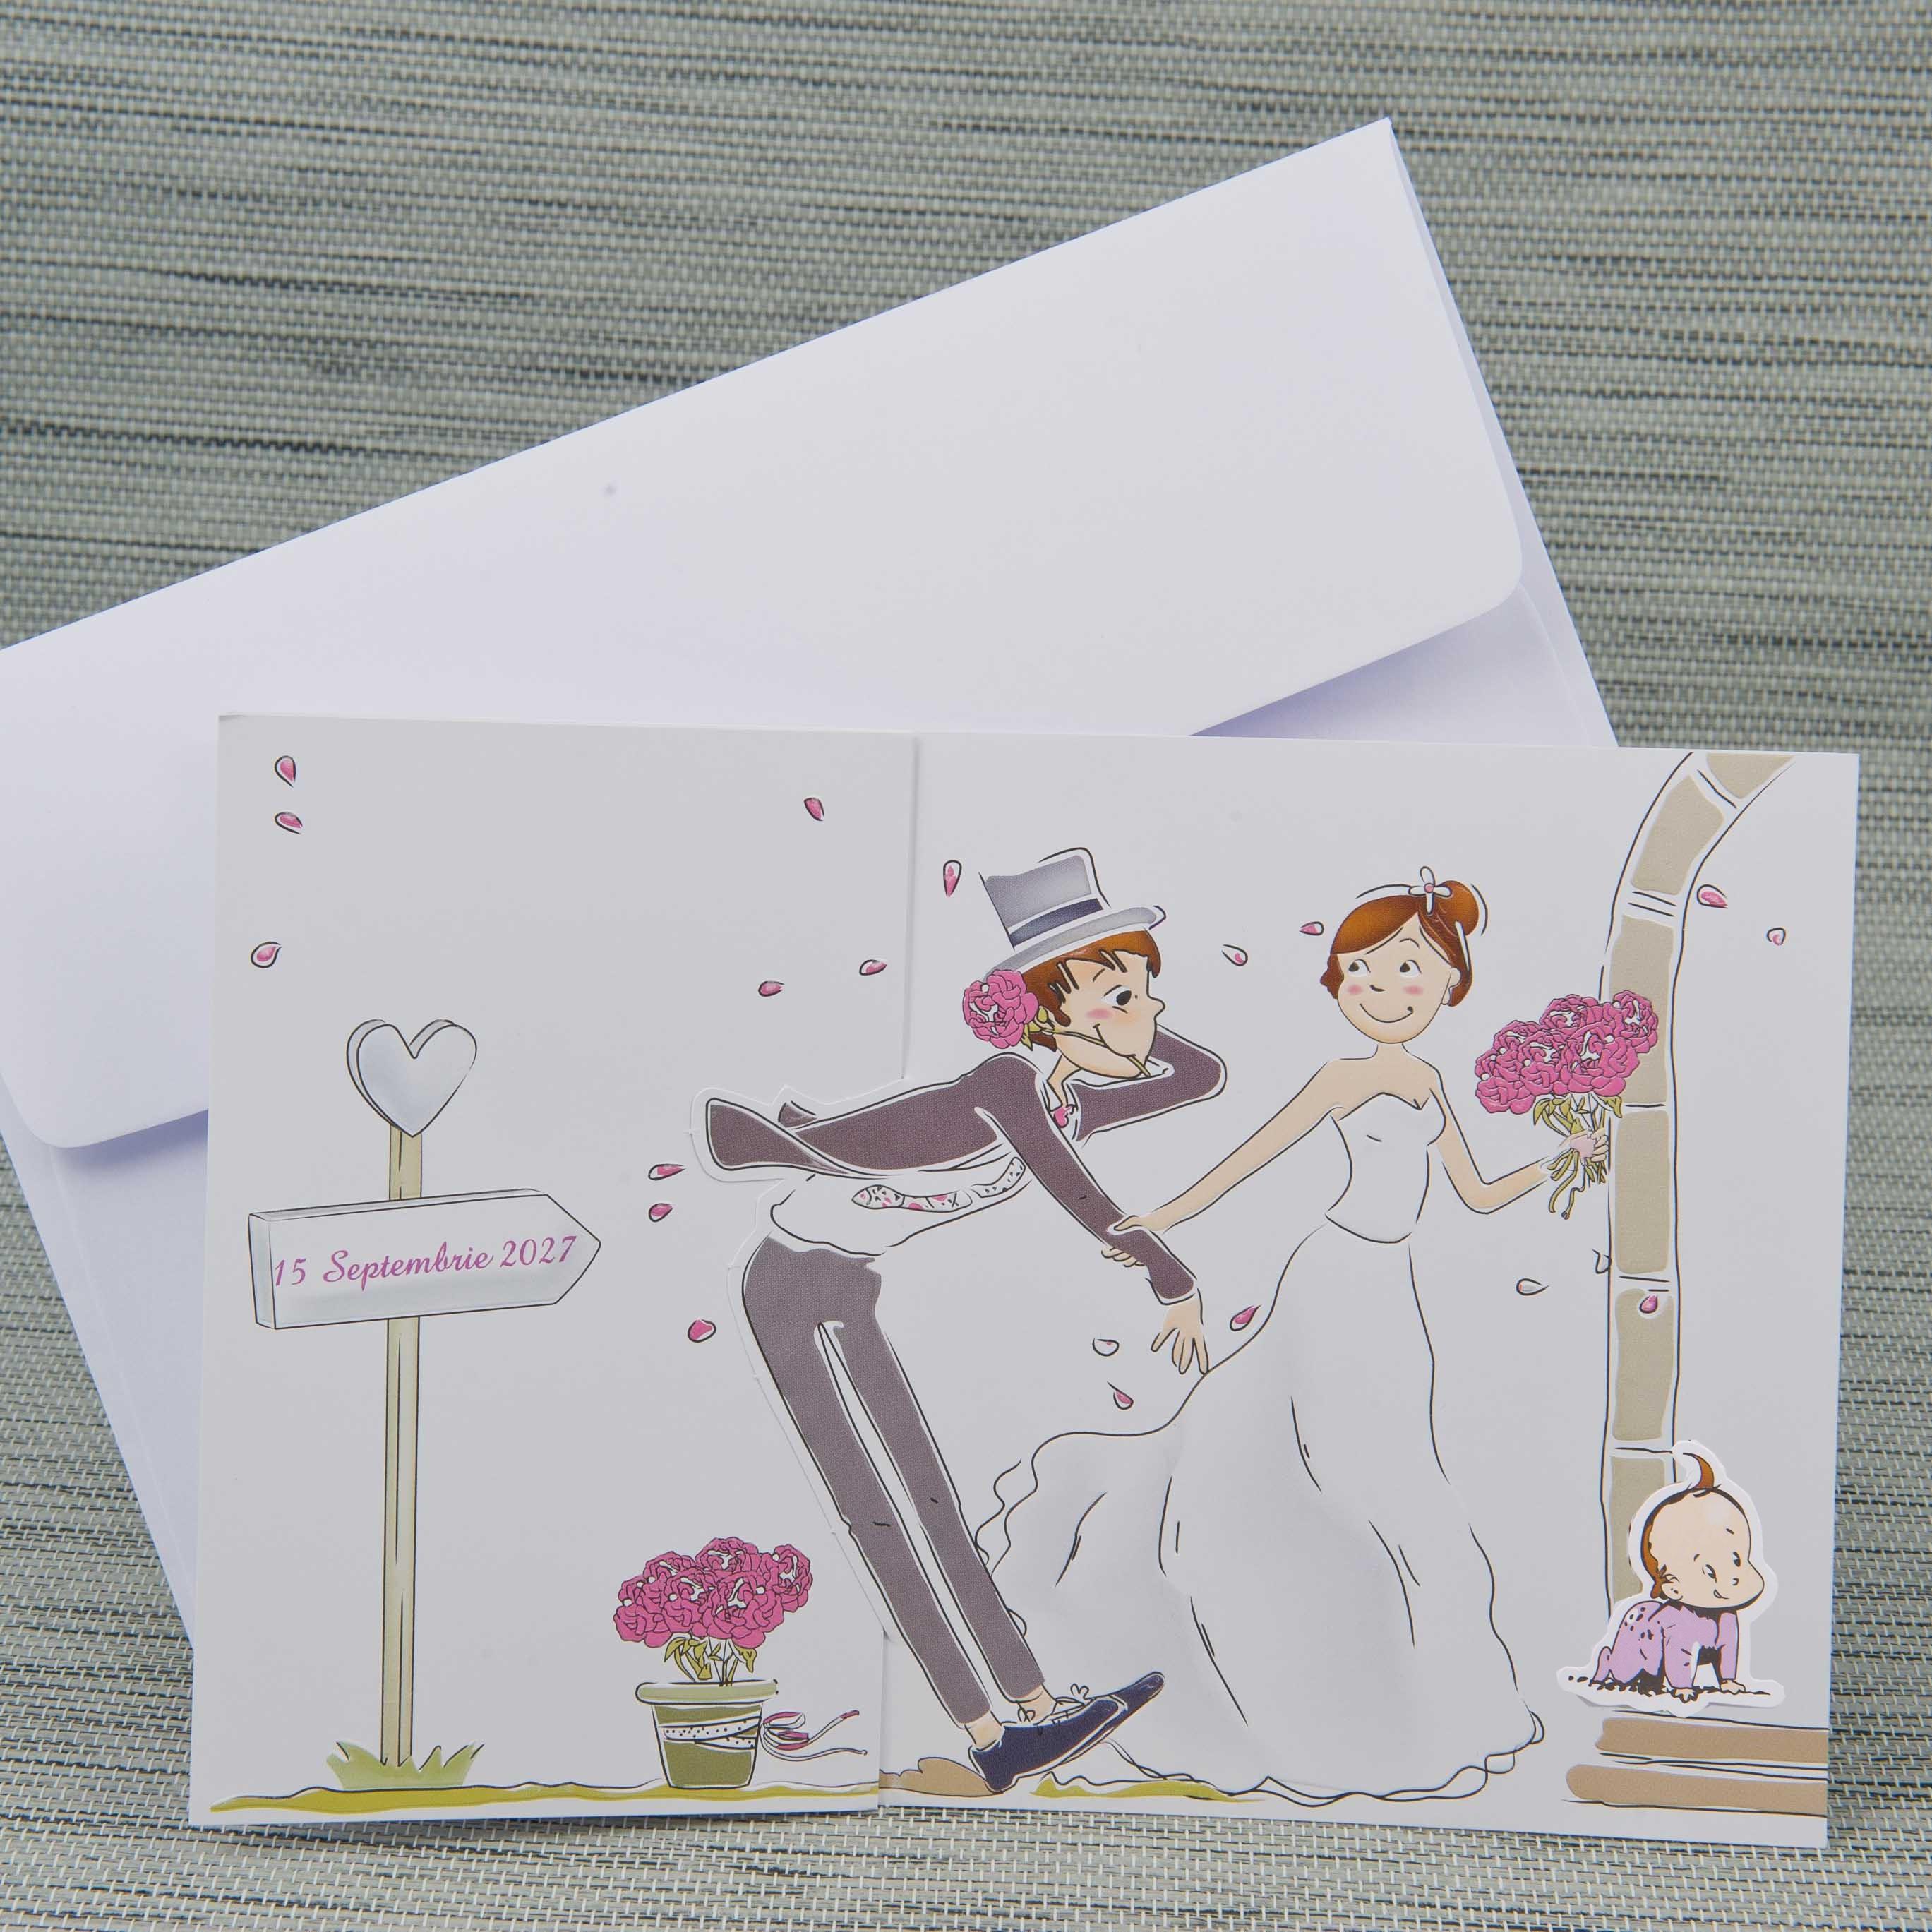 1163 2 In 1 Invitatii Nunta Invitatii Botez Marturii Plicuri